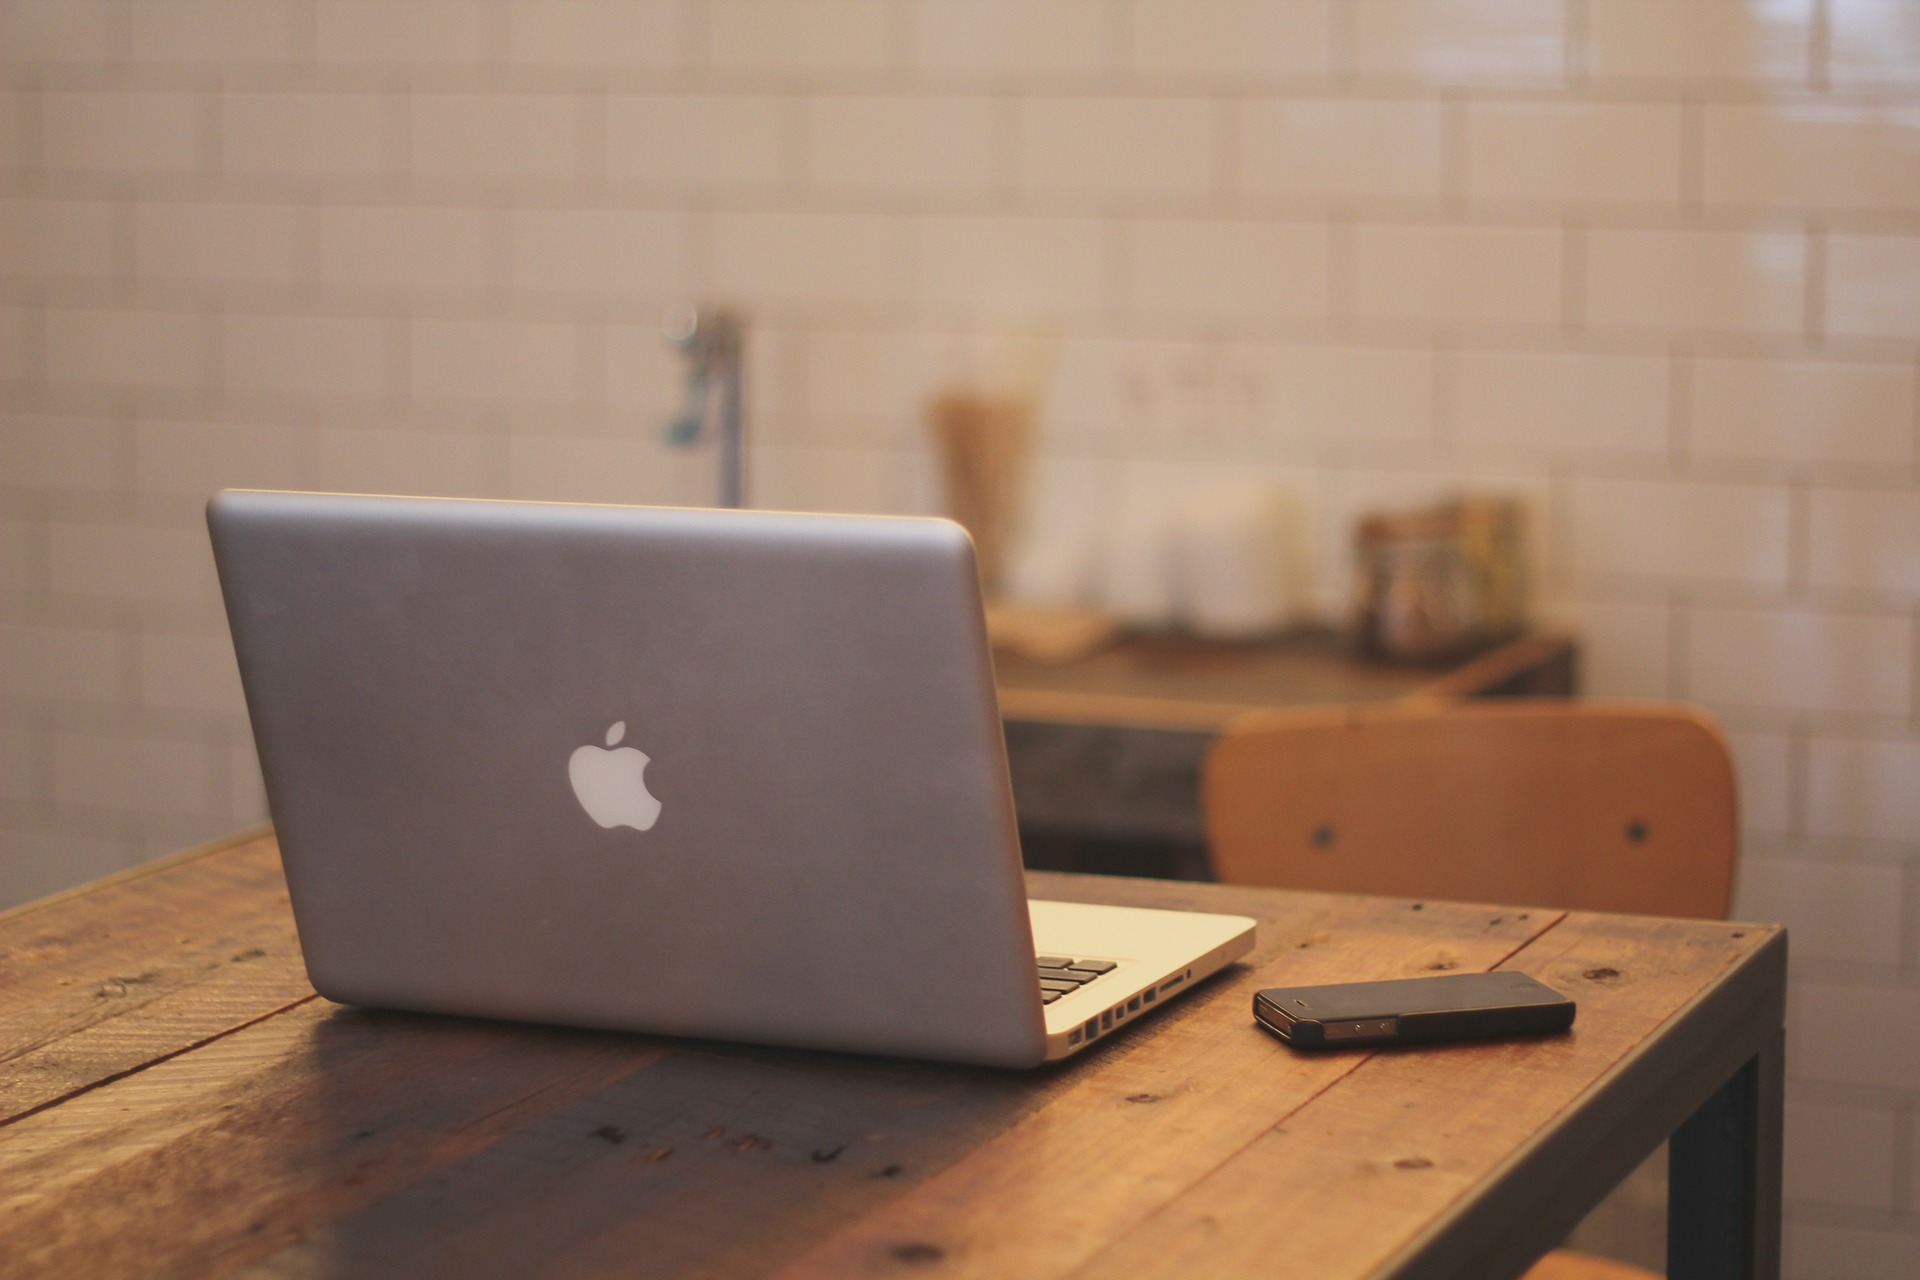 macbook-336692_1920.jpg